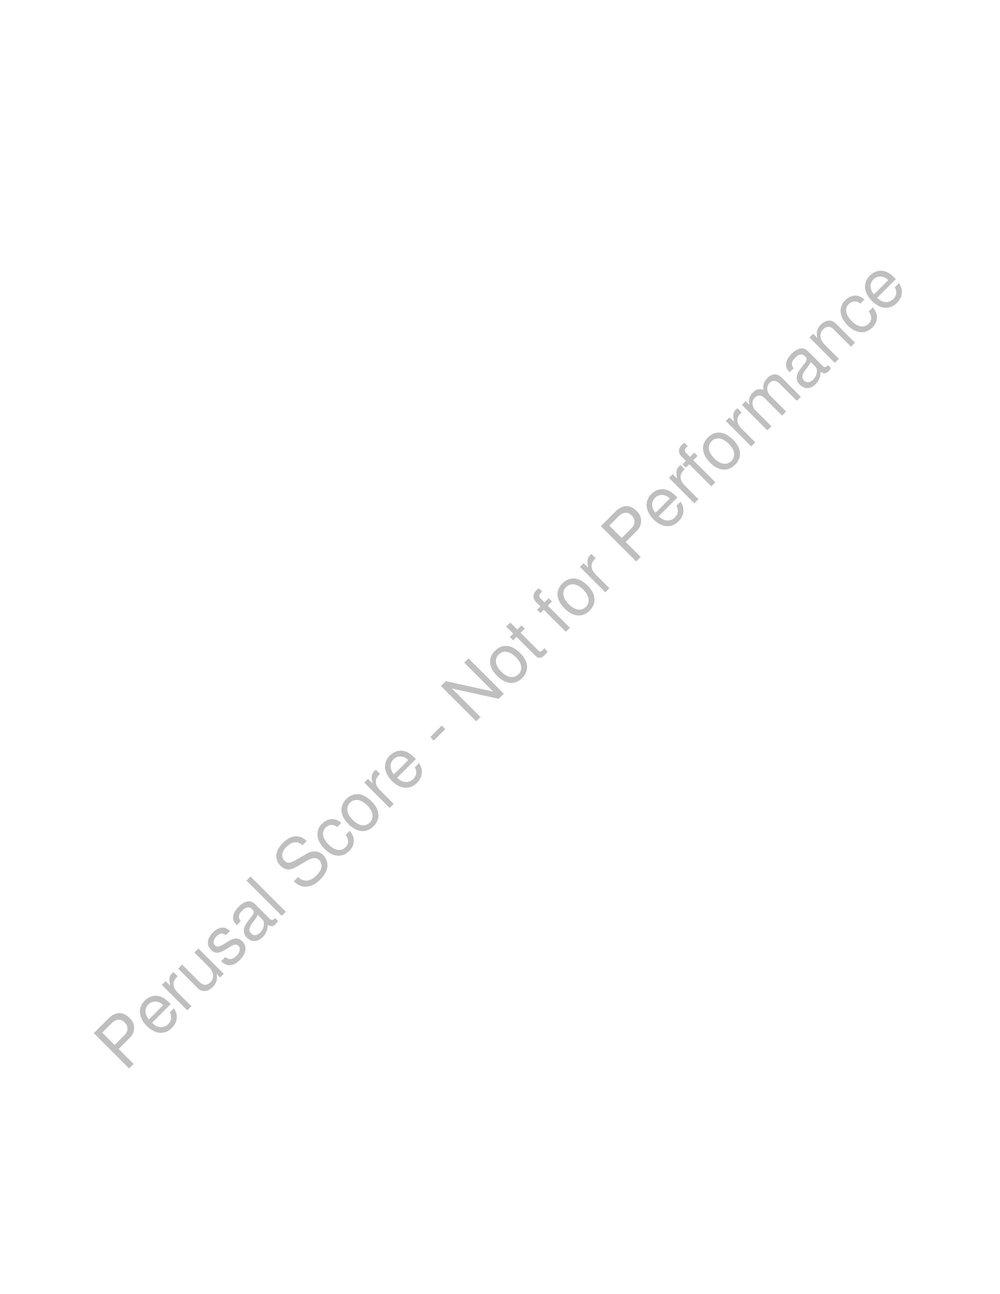 Boyd Amerigo Score-watermark-page-006.jpg